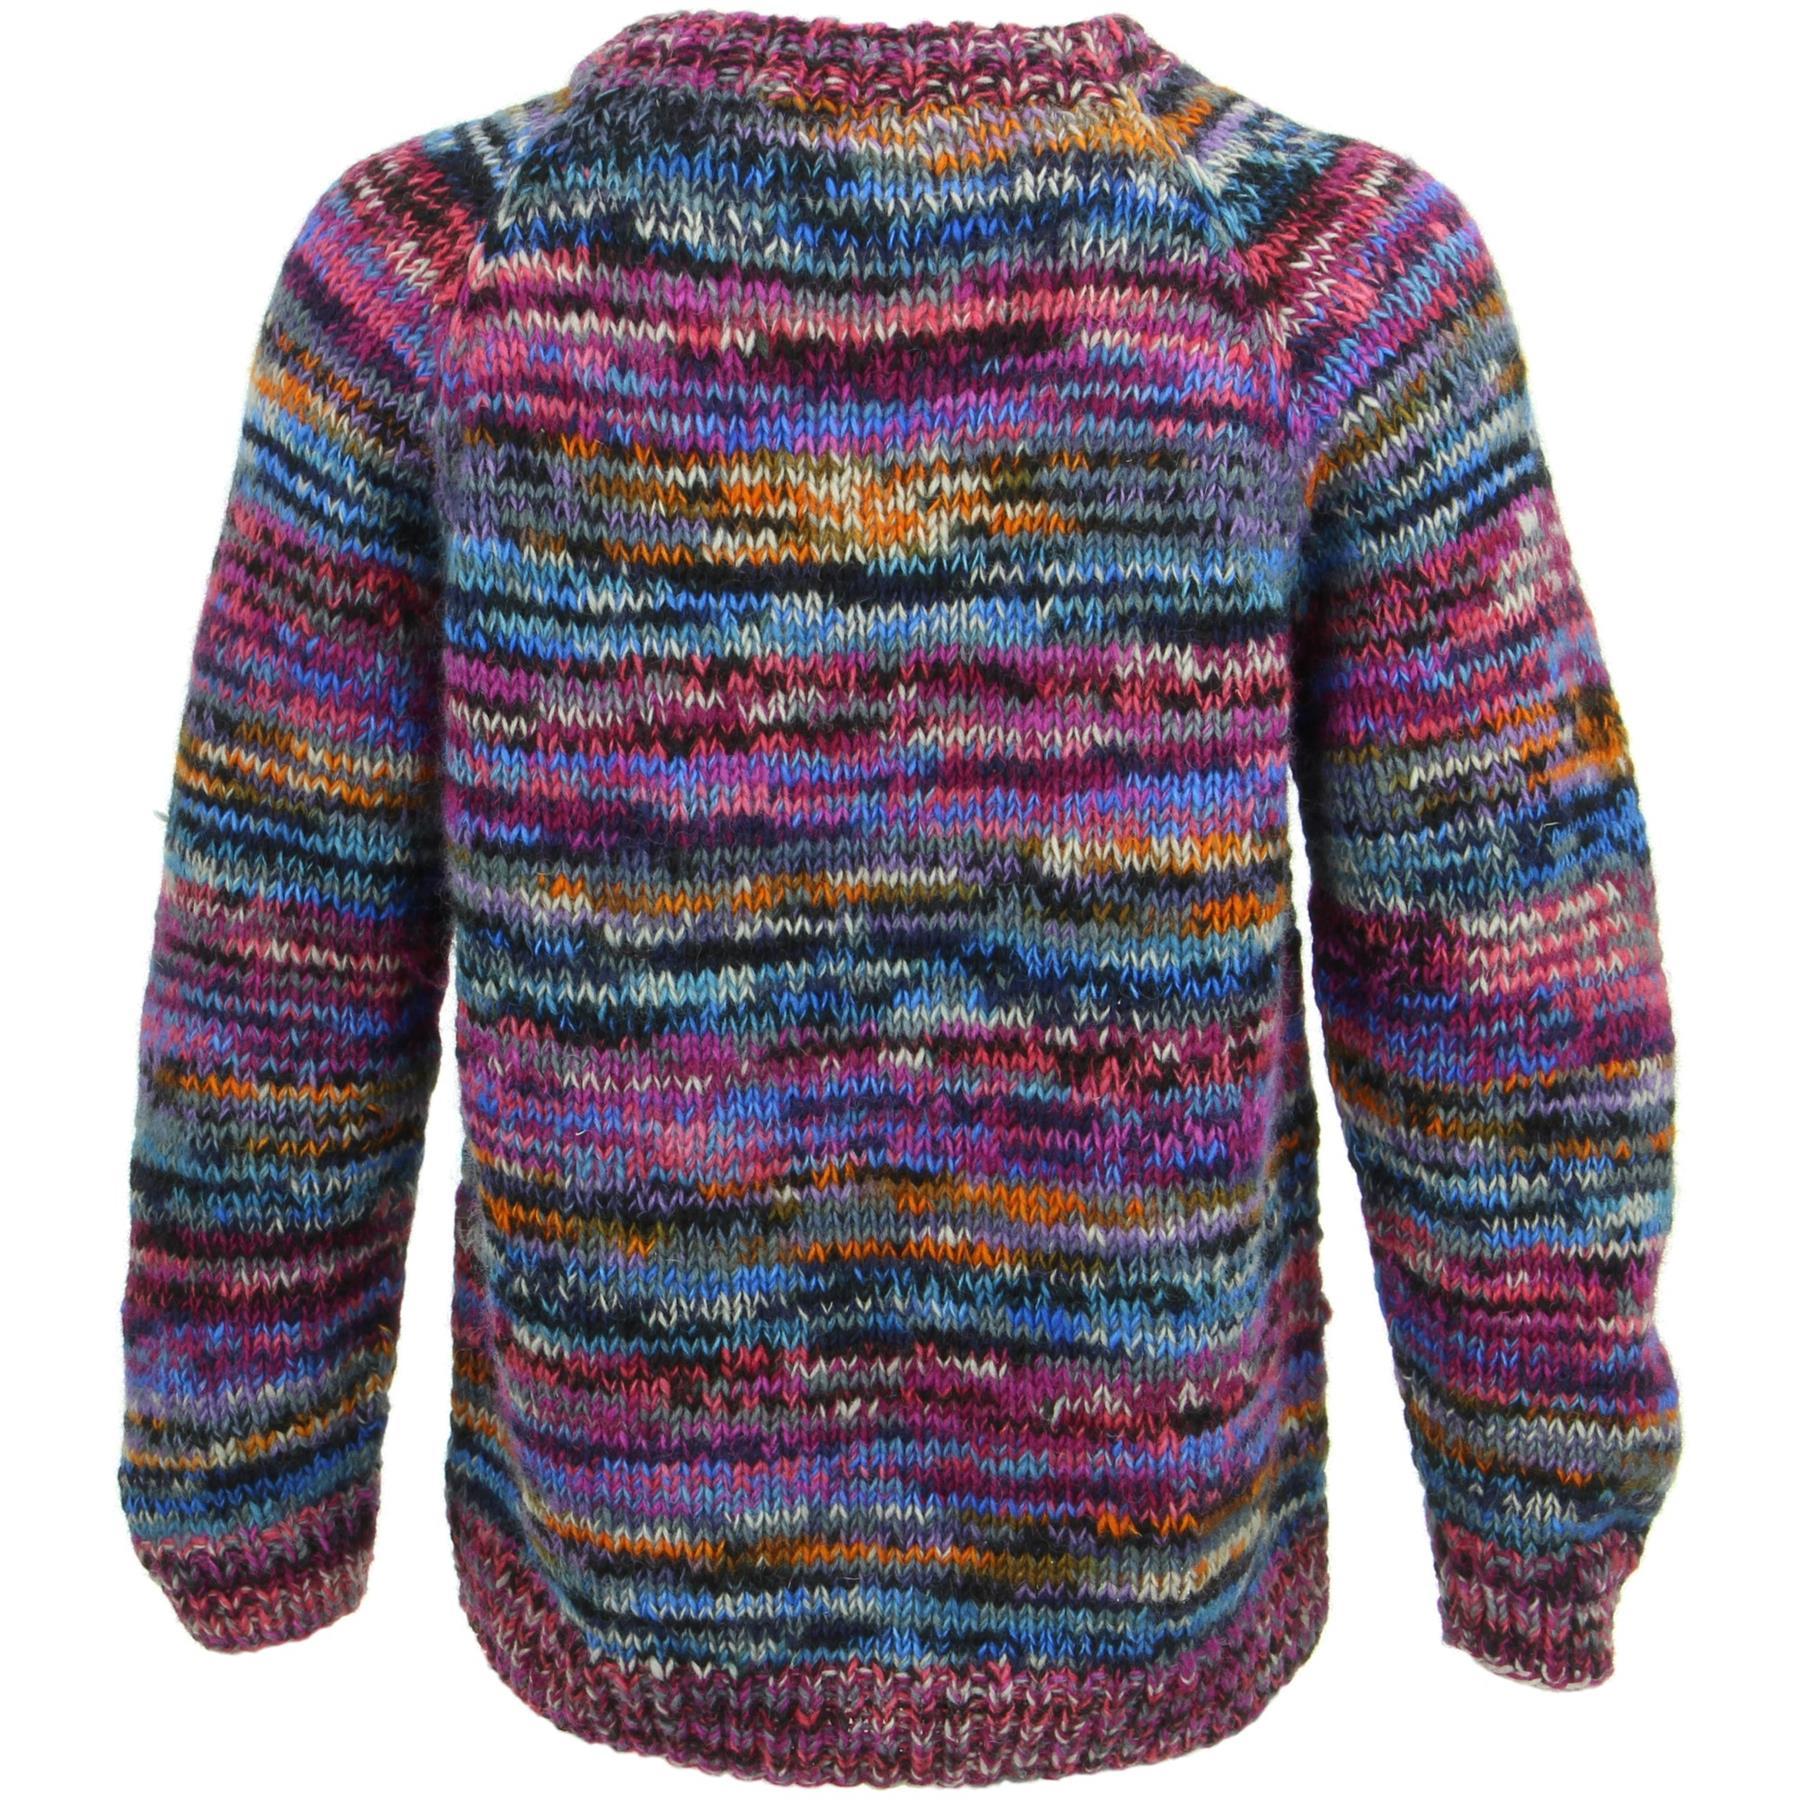 thumbnail 19 - Wool Knit Jumper Sweater Pullover Fairisle Nordic Abstract Warm Nepal Loose